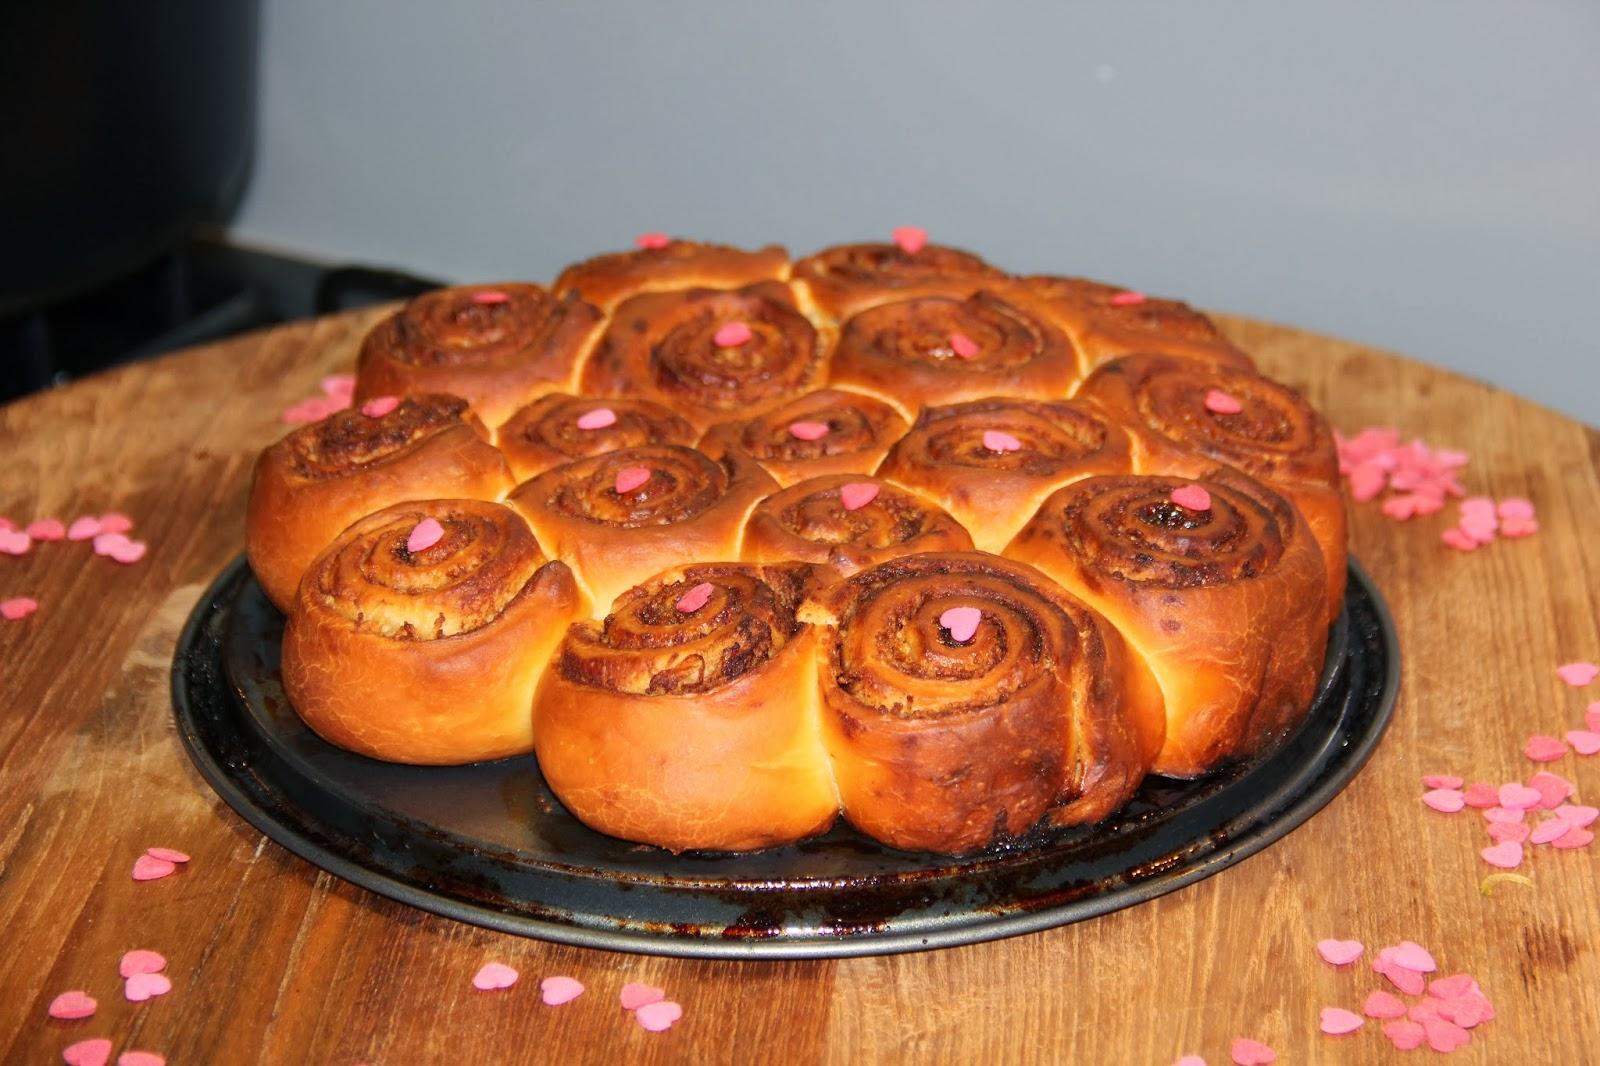 Kaneelbroodjes met appel - www.desmaakvancecile.com